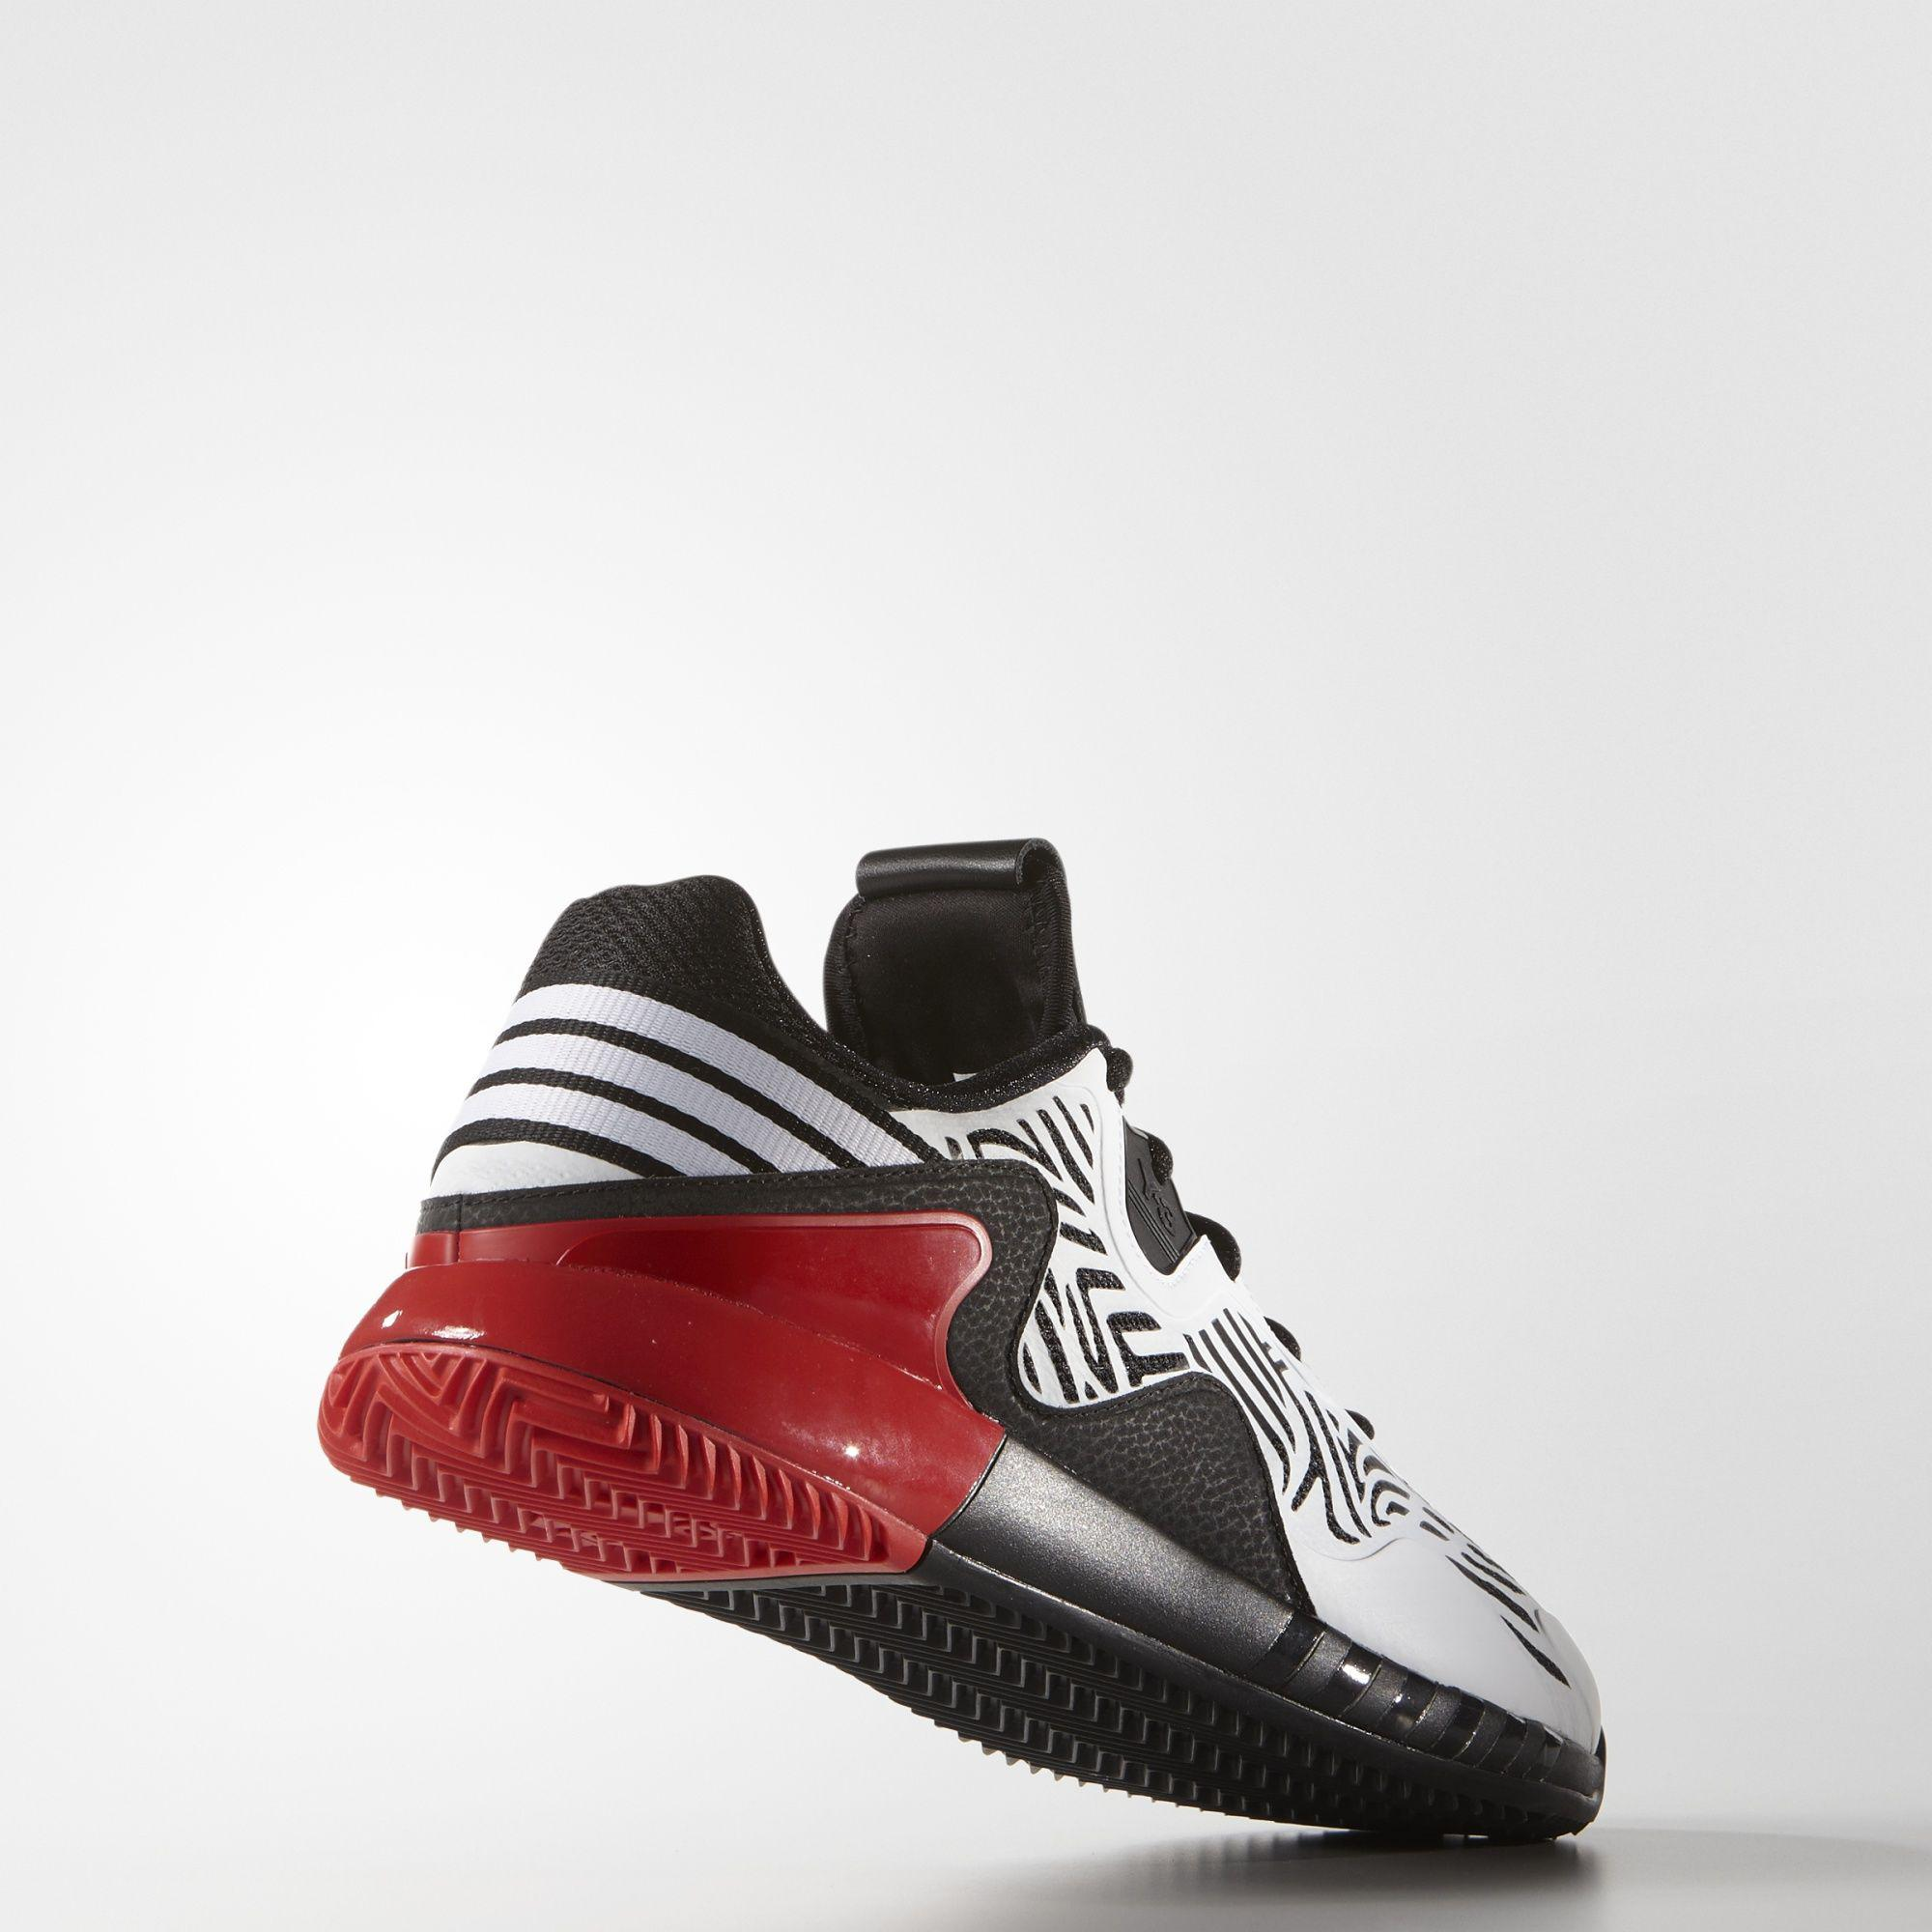 9debe230a0a0a Adidas Mens Adizero Y-3 2016 Tennis Shoes - Black White - Tennisnuts.com